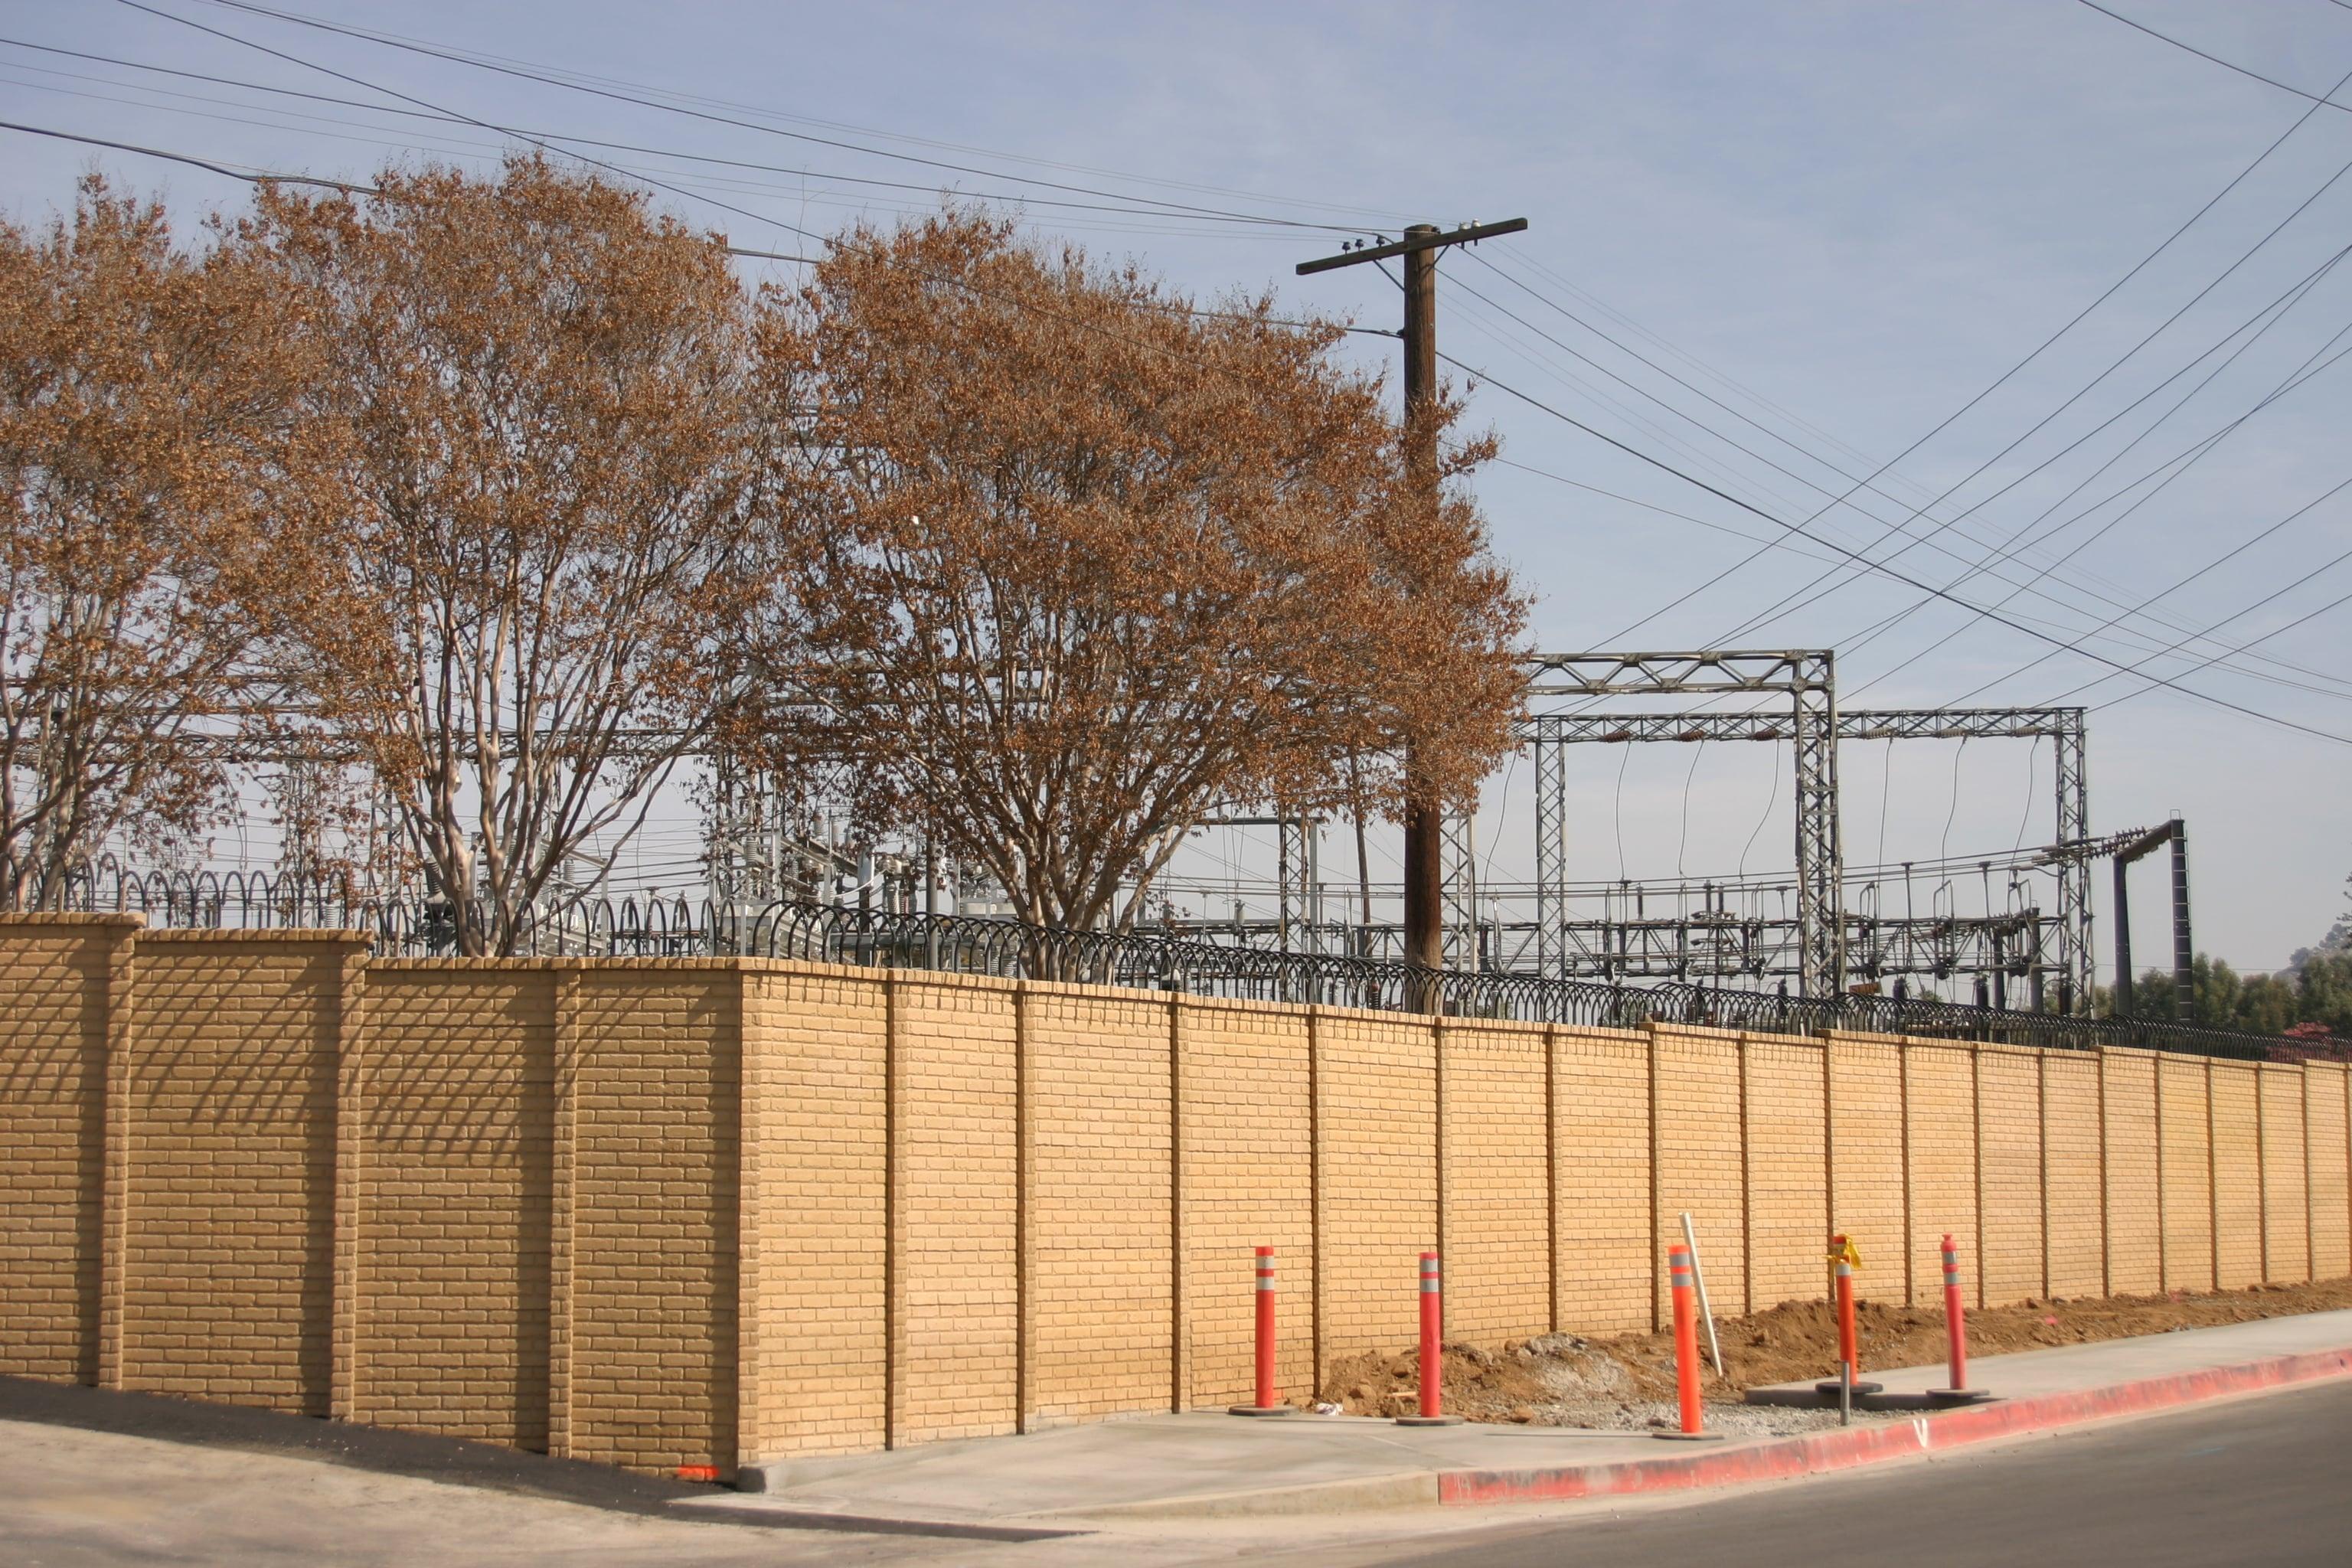 precast concrete screening wall utility substation